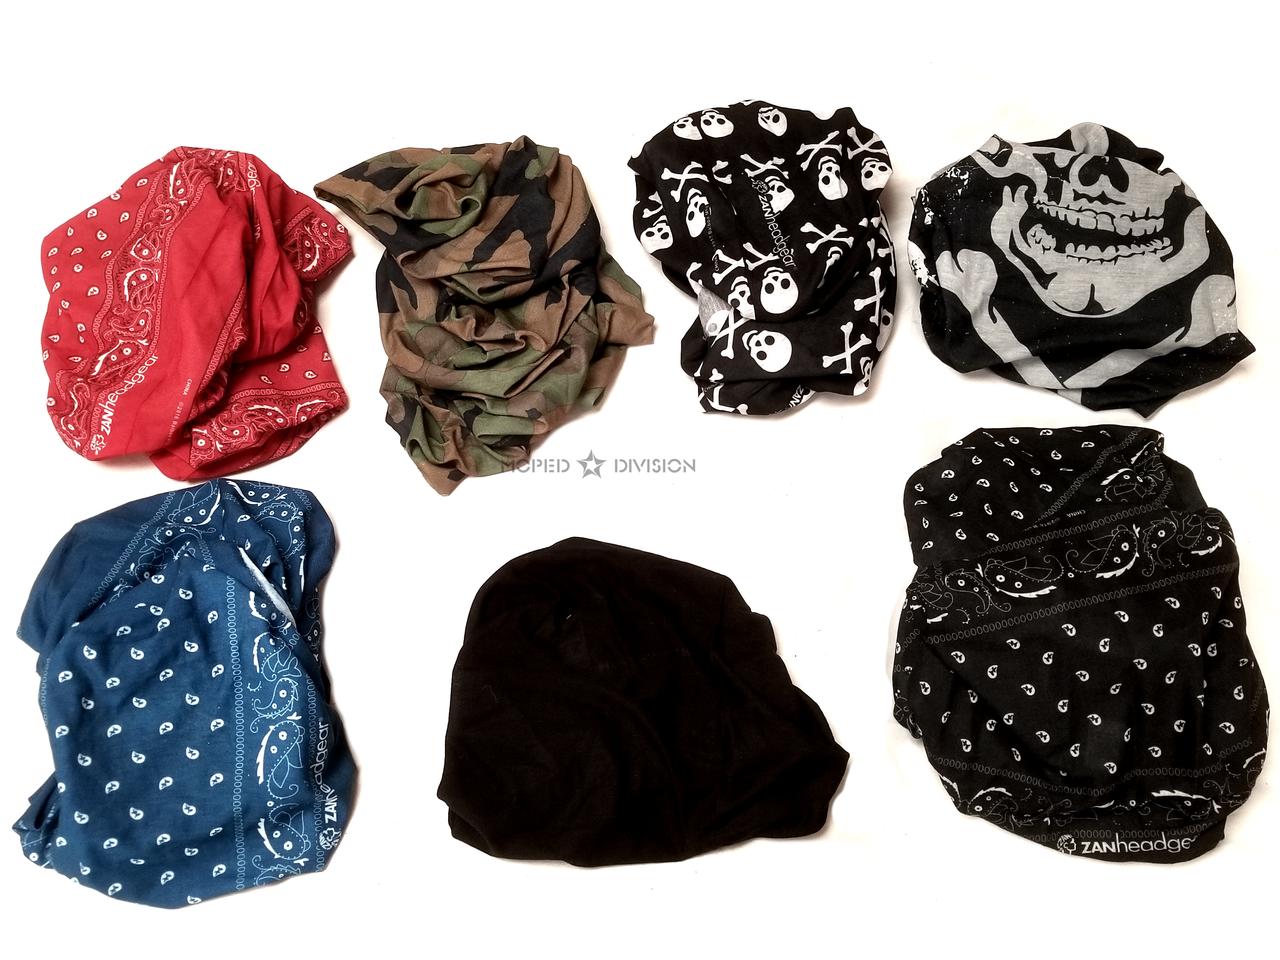 Neck Warmer / Face Mask / Motley Tube - Various styles